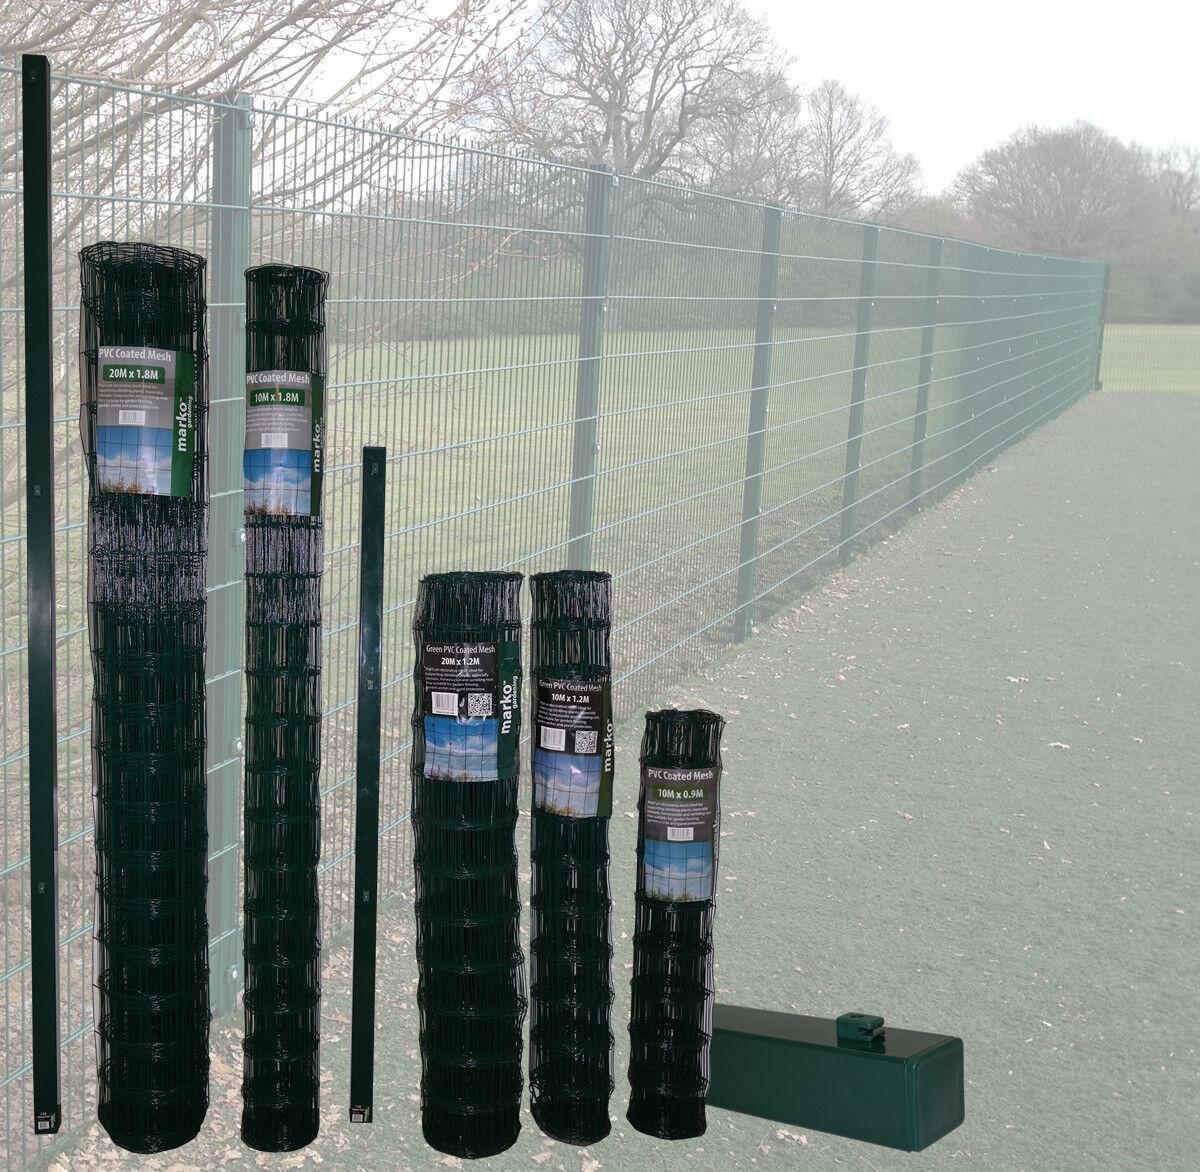 Marko Fencing Pvc Green Plastic Coated Metal Garden Fence Mesh 0 6m X 10m